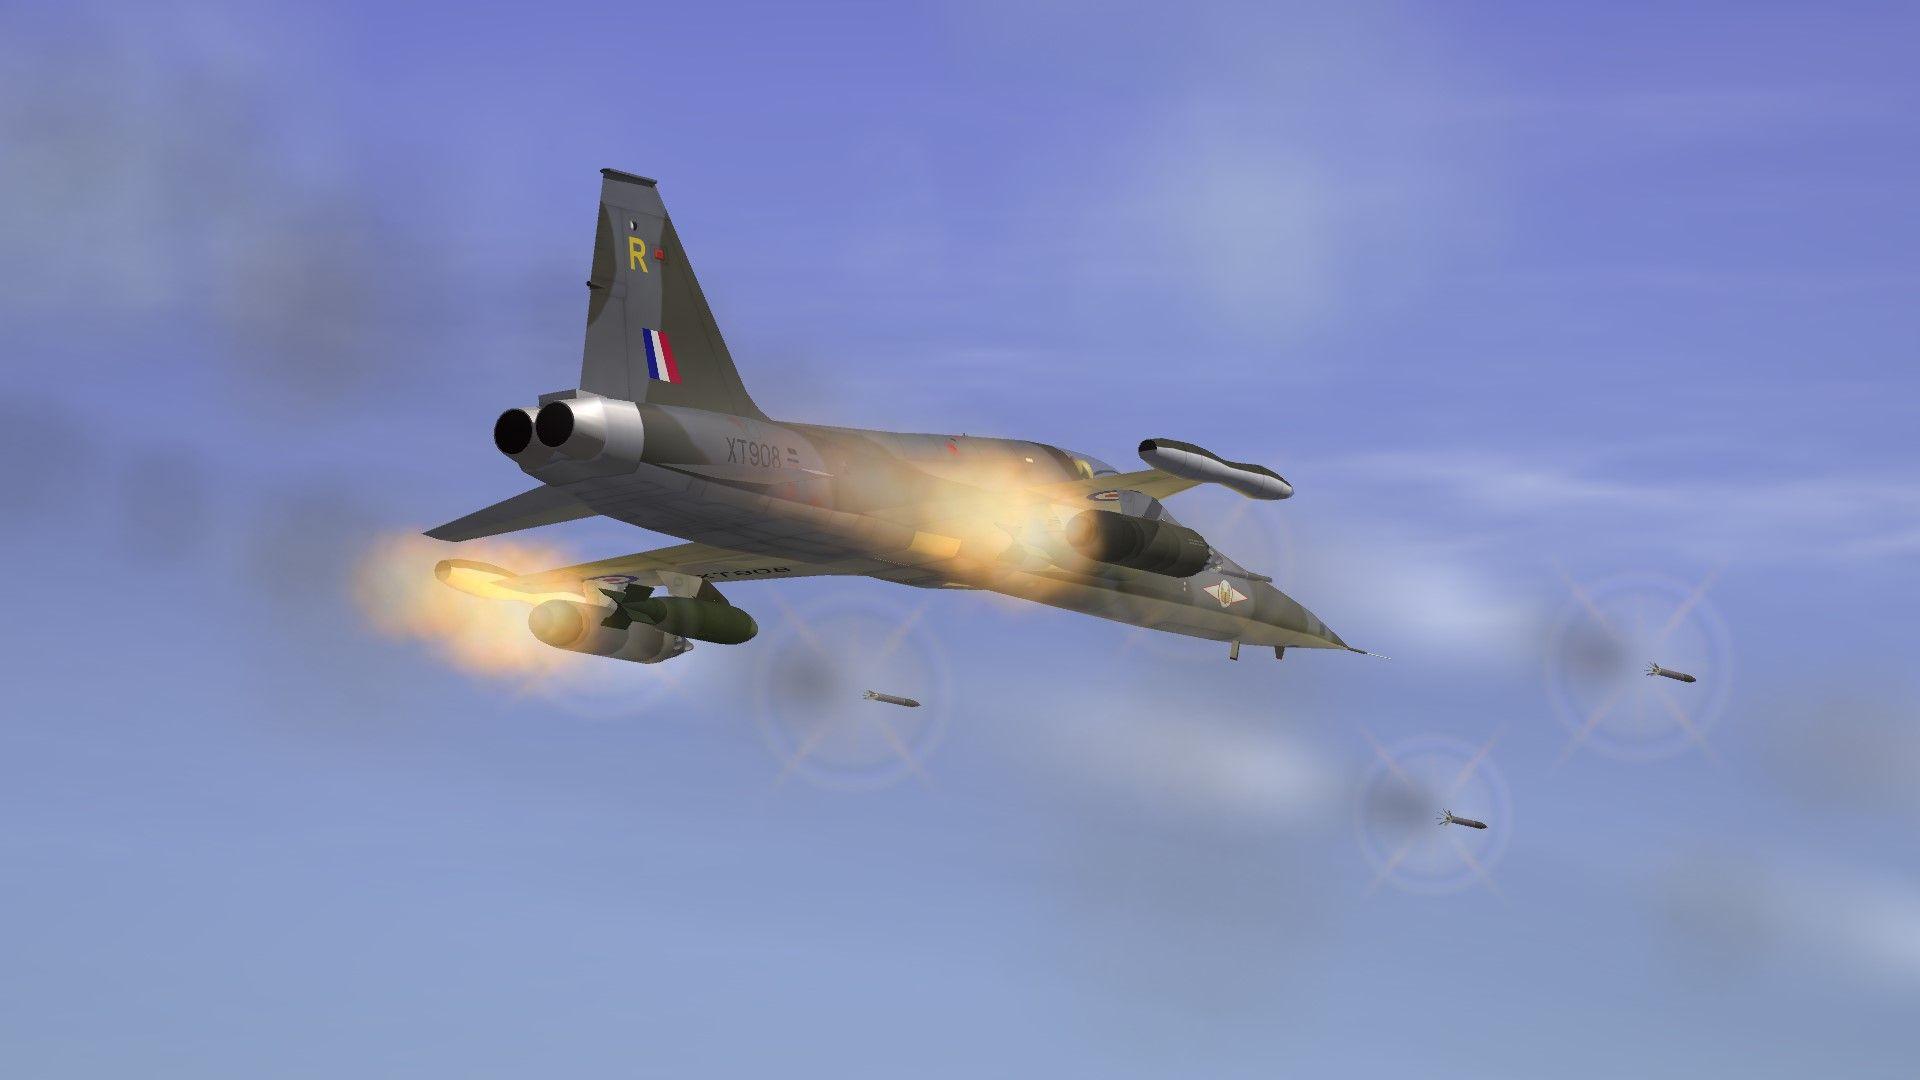 RAFF-5KFREEDOMFIGHTER04_zps898f5f30.jpg